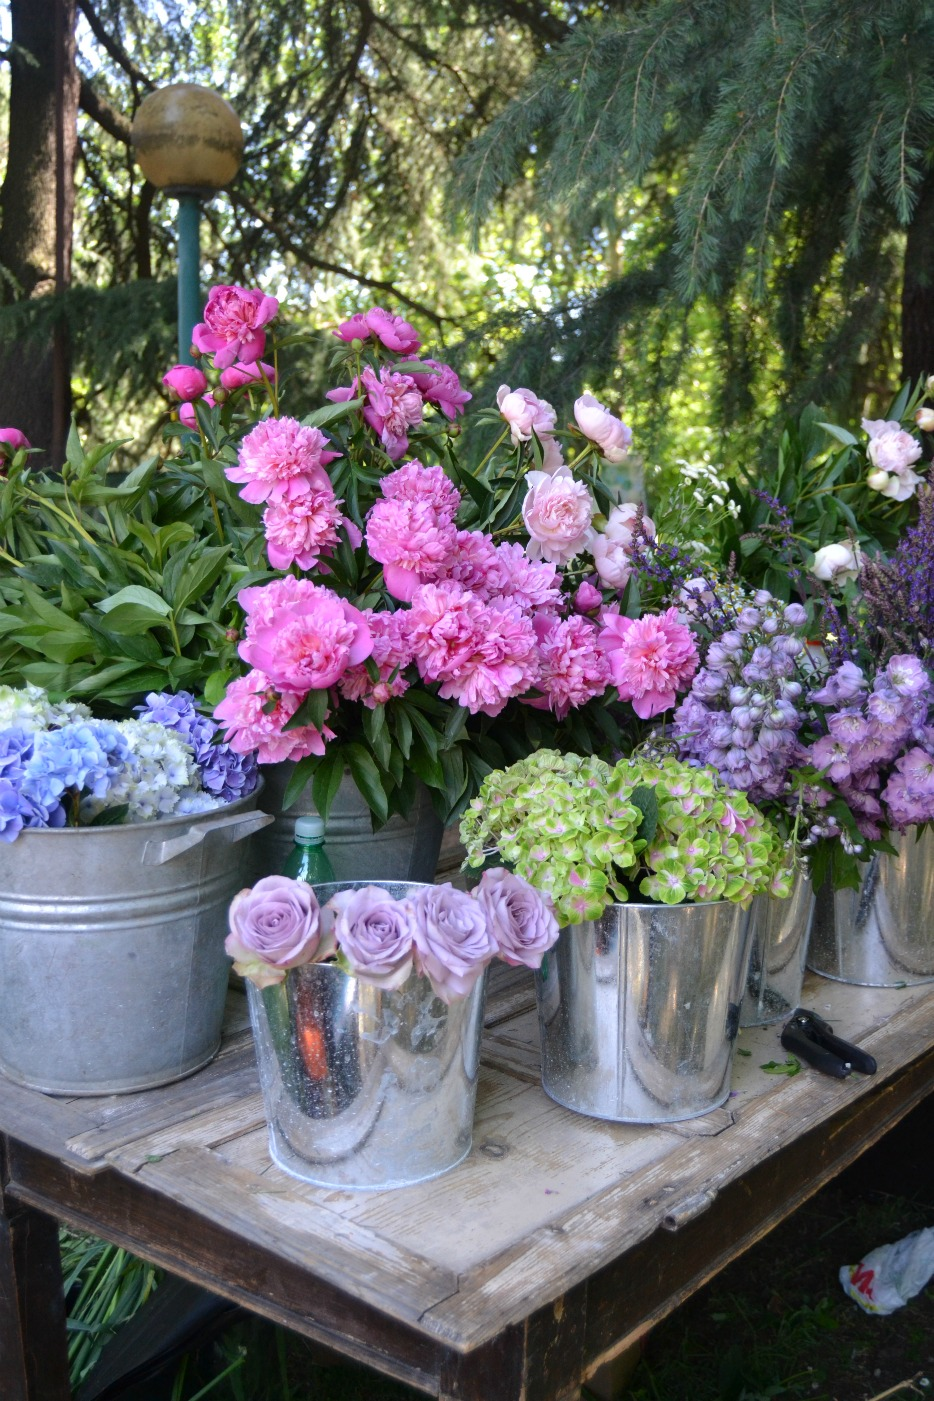 Cream life terrazze e giardini i fiori for Terrazze e giardini